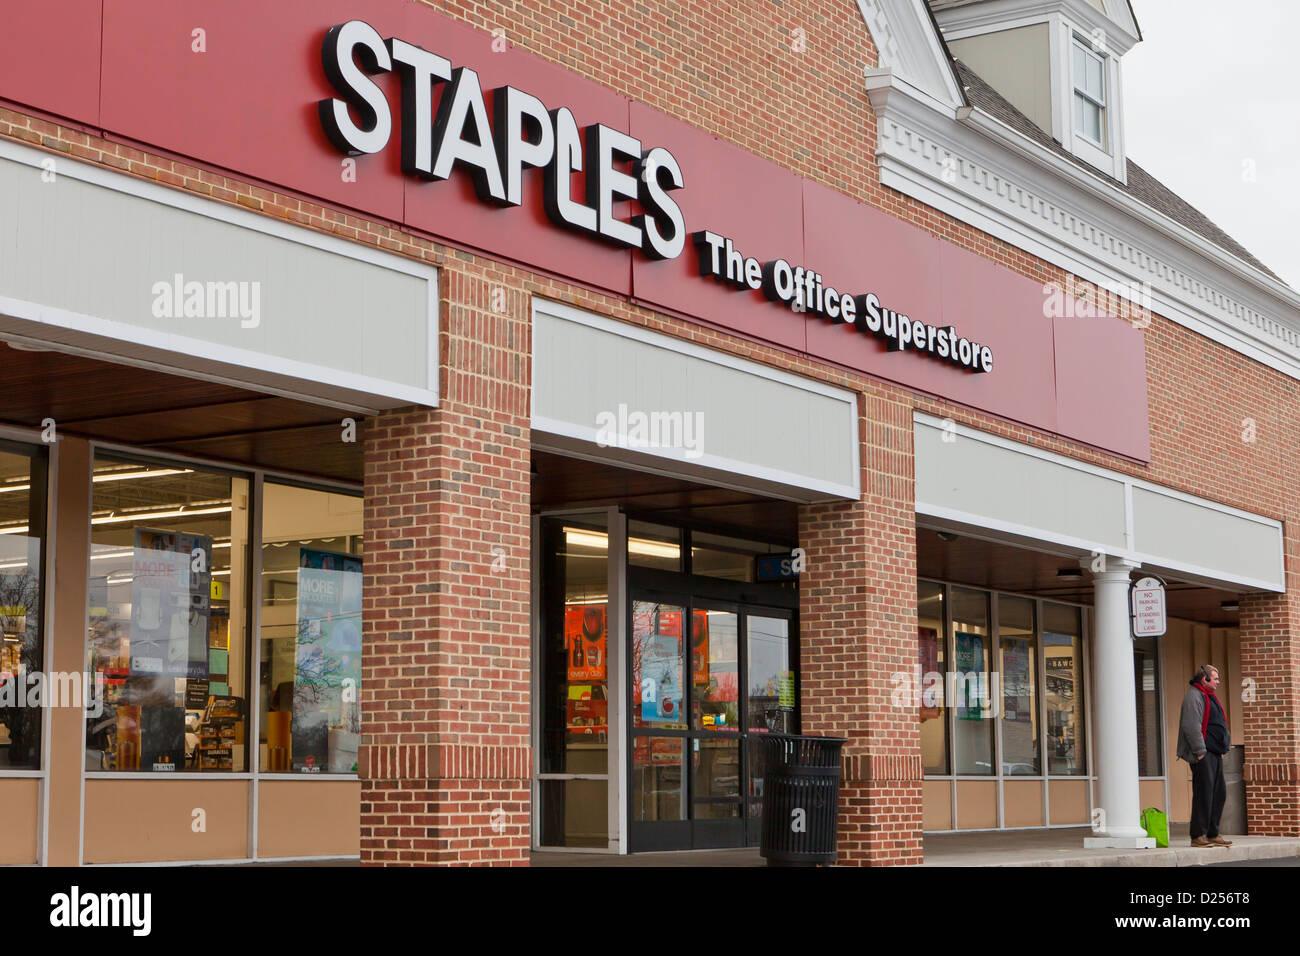 Staples storefront - Stock Image